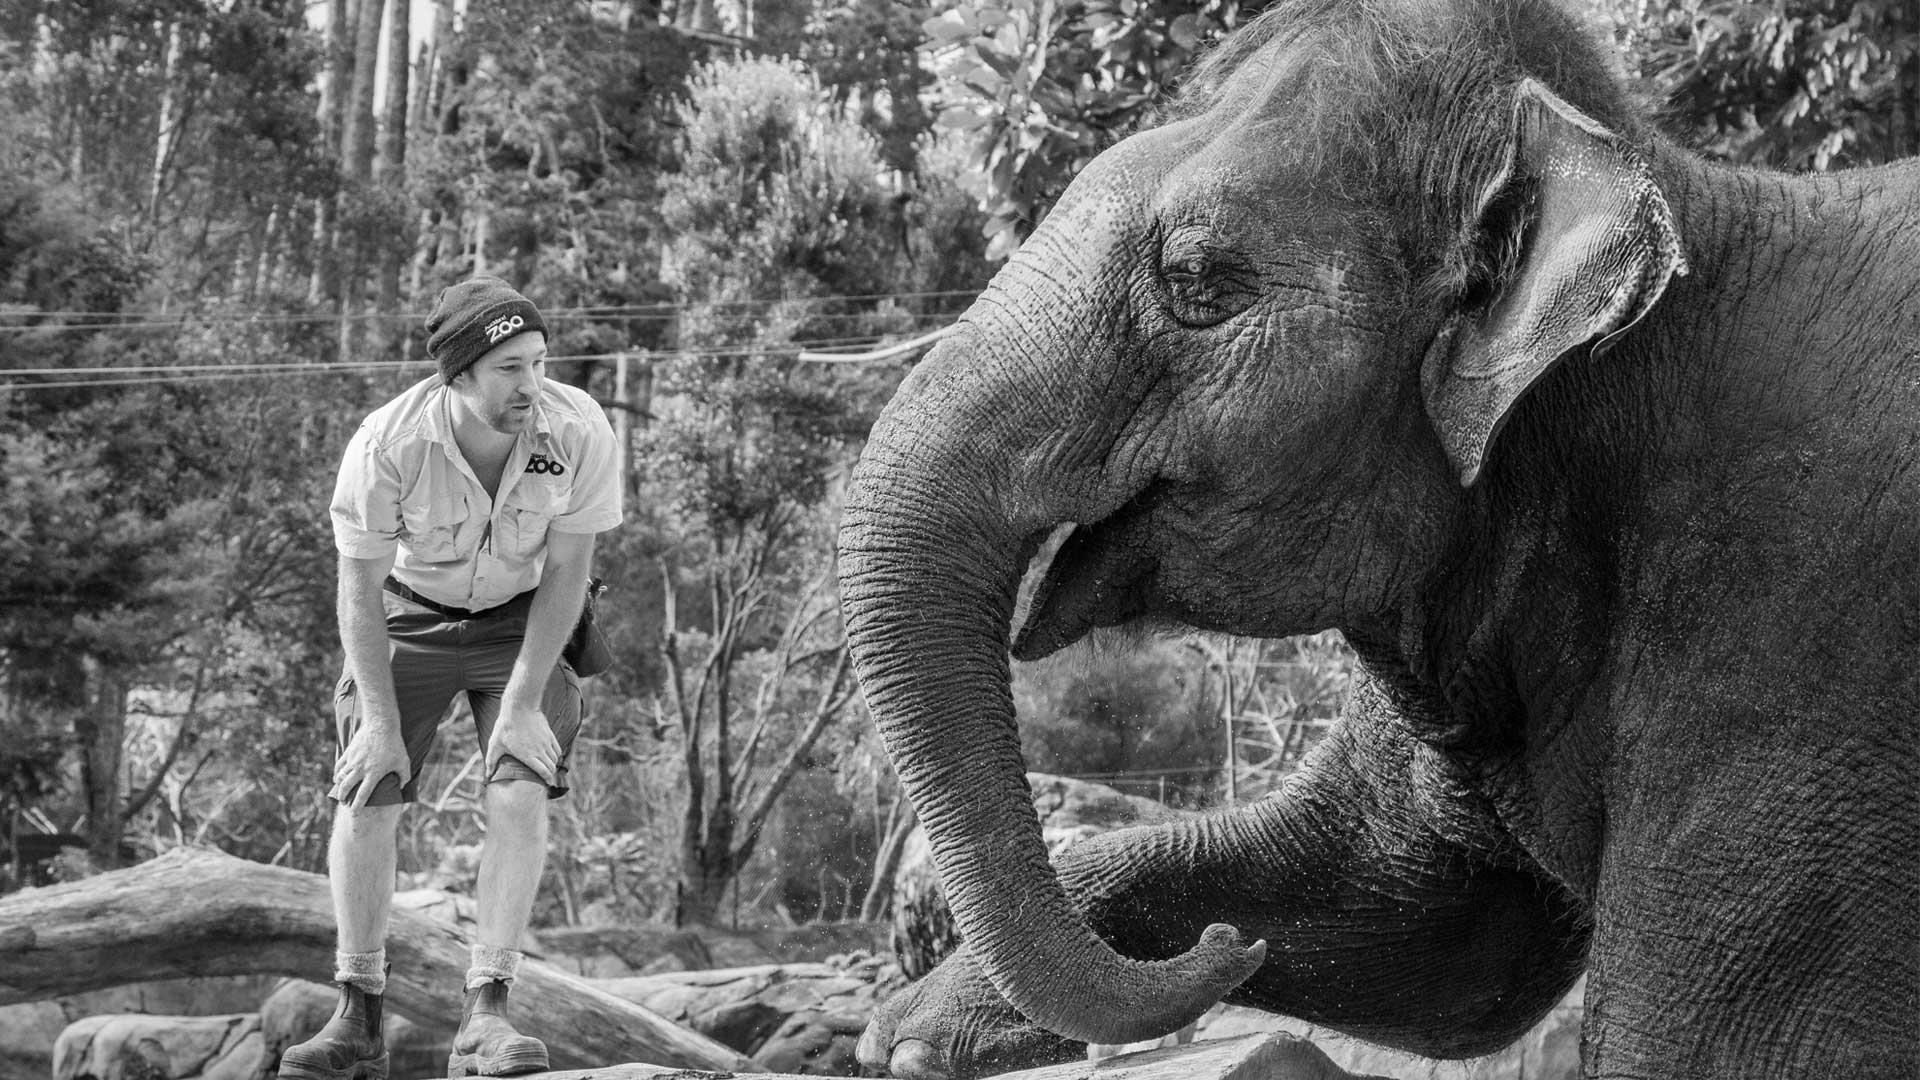 https://rfacdn.nz/zoo/assets/media/world-elephant-day-gallery-10.jpg